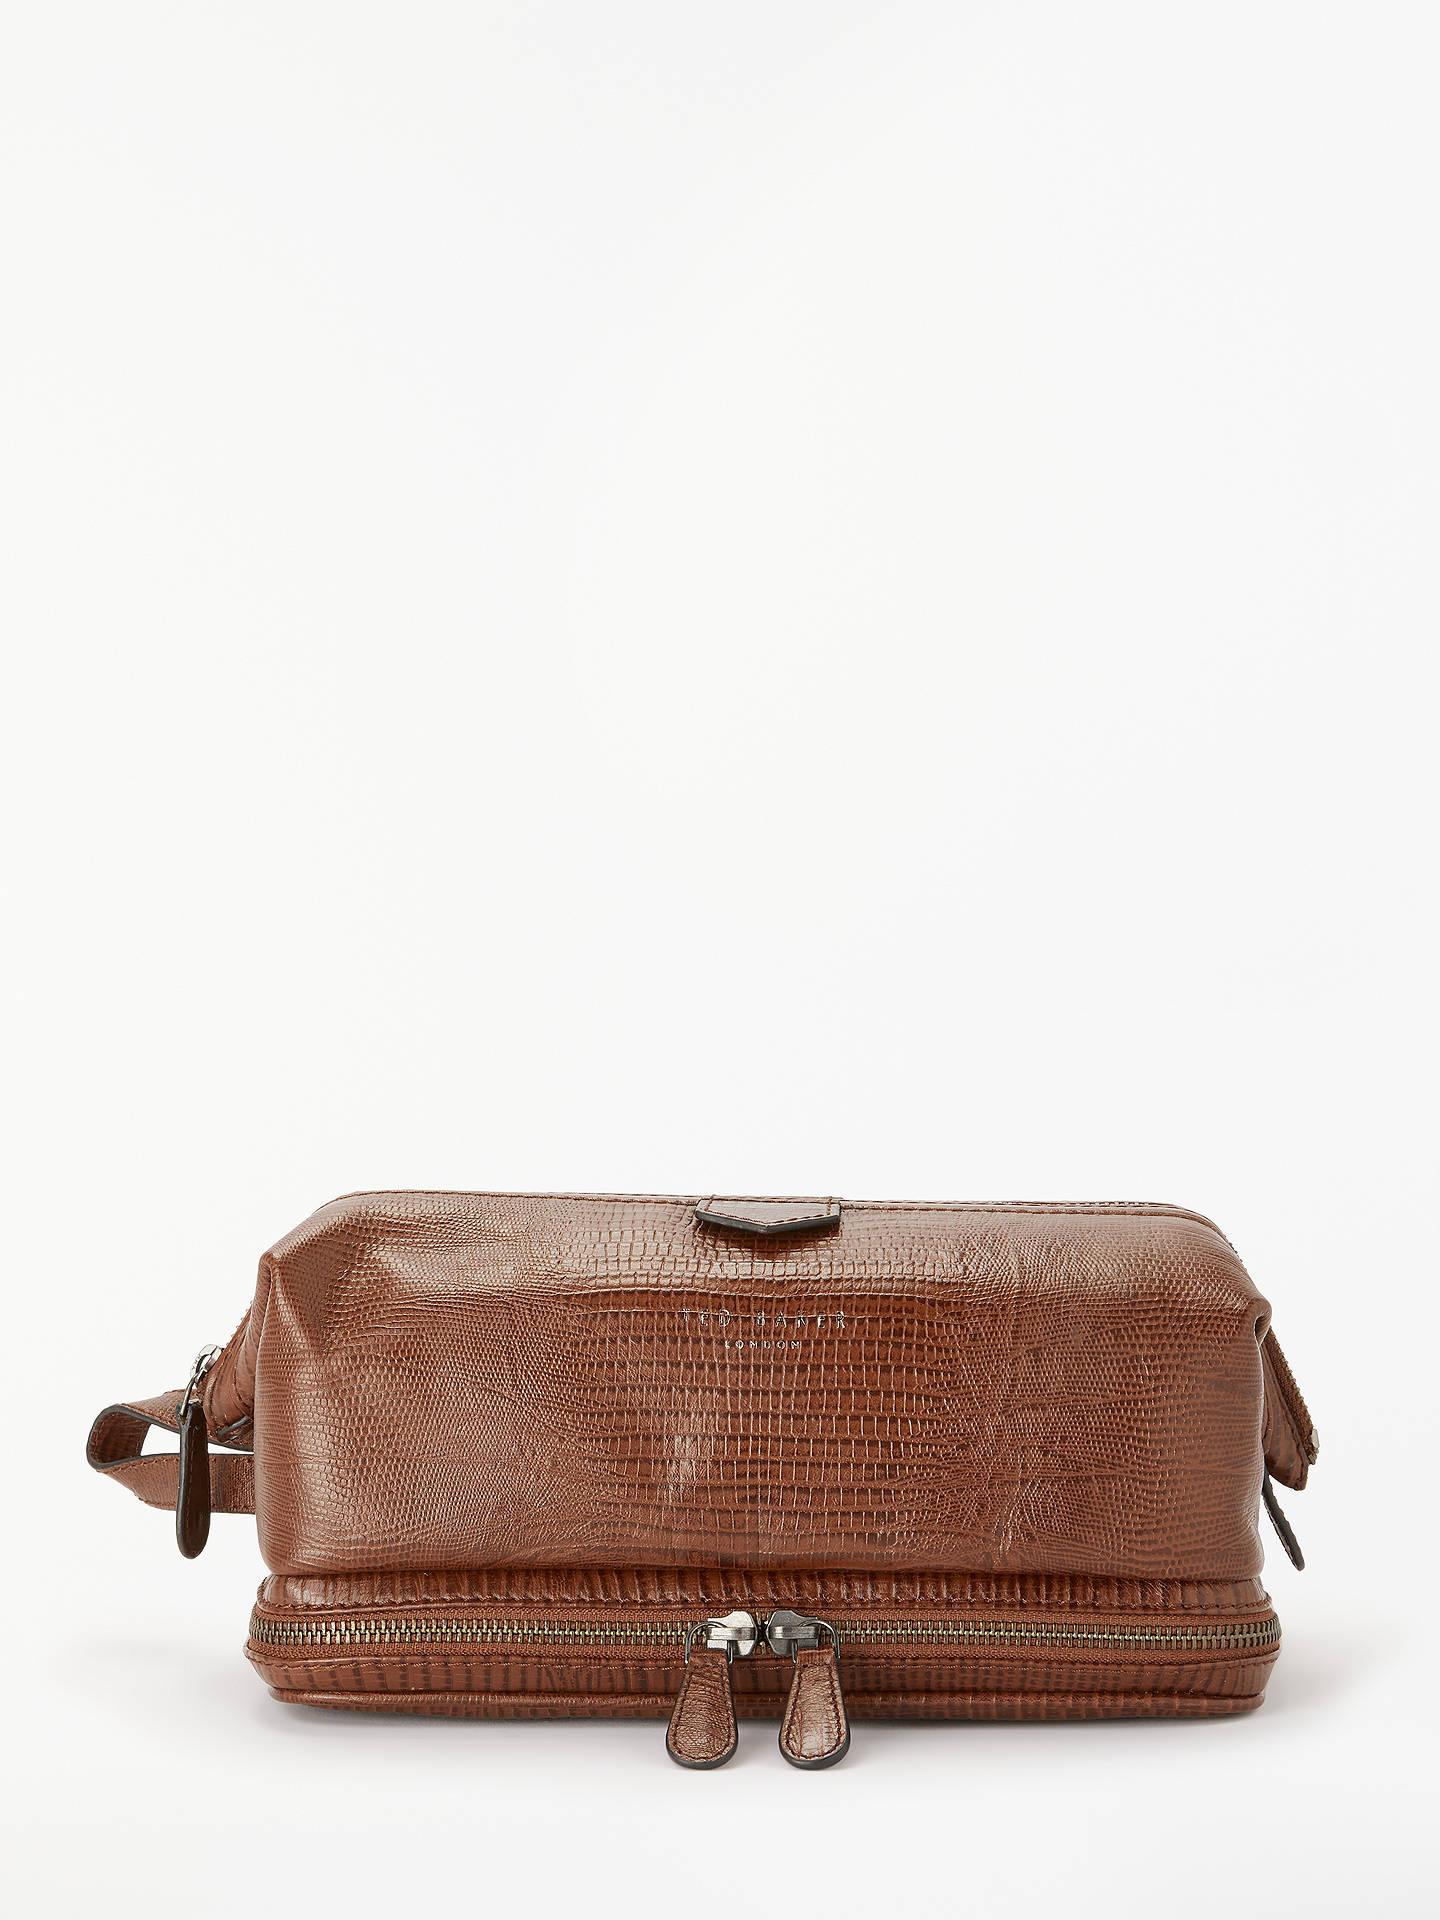 4581d3d398cb Buy Ted Baker Chocks Croc Effect Leather Wash Bag